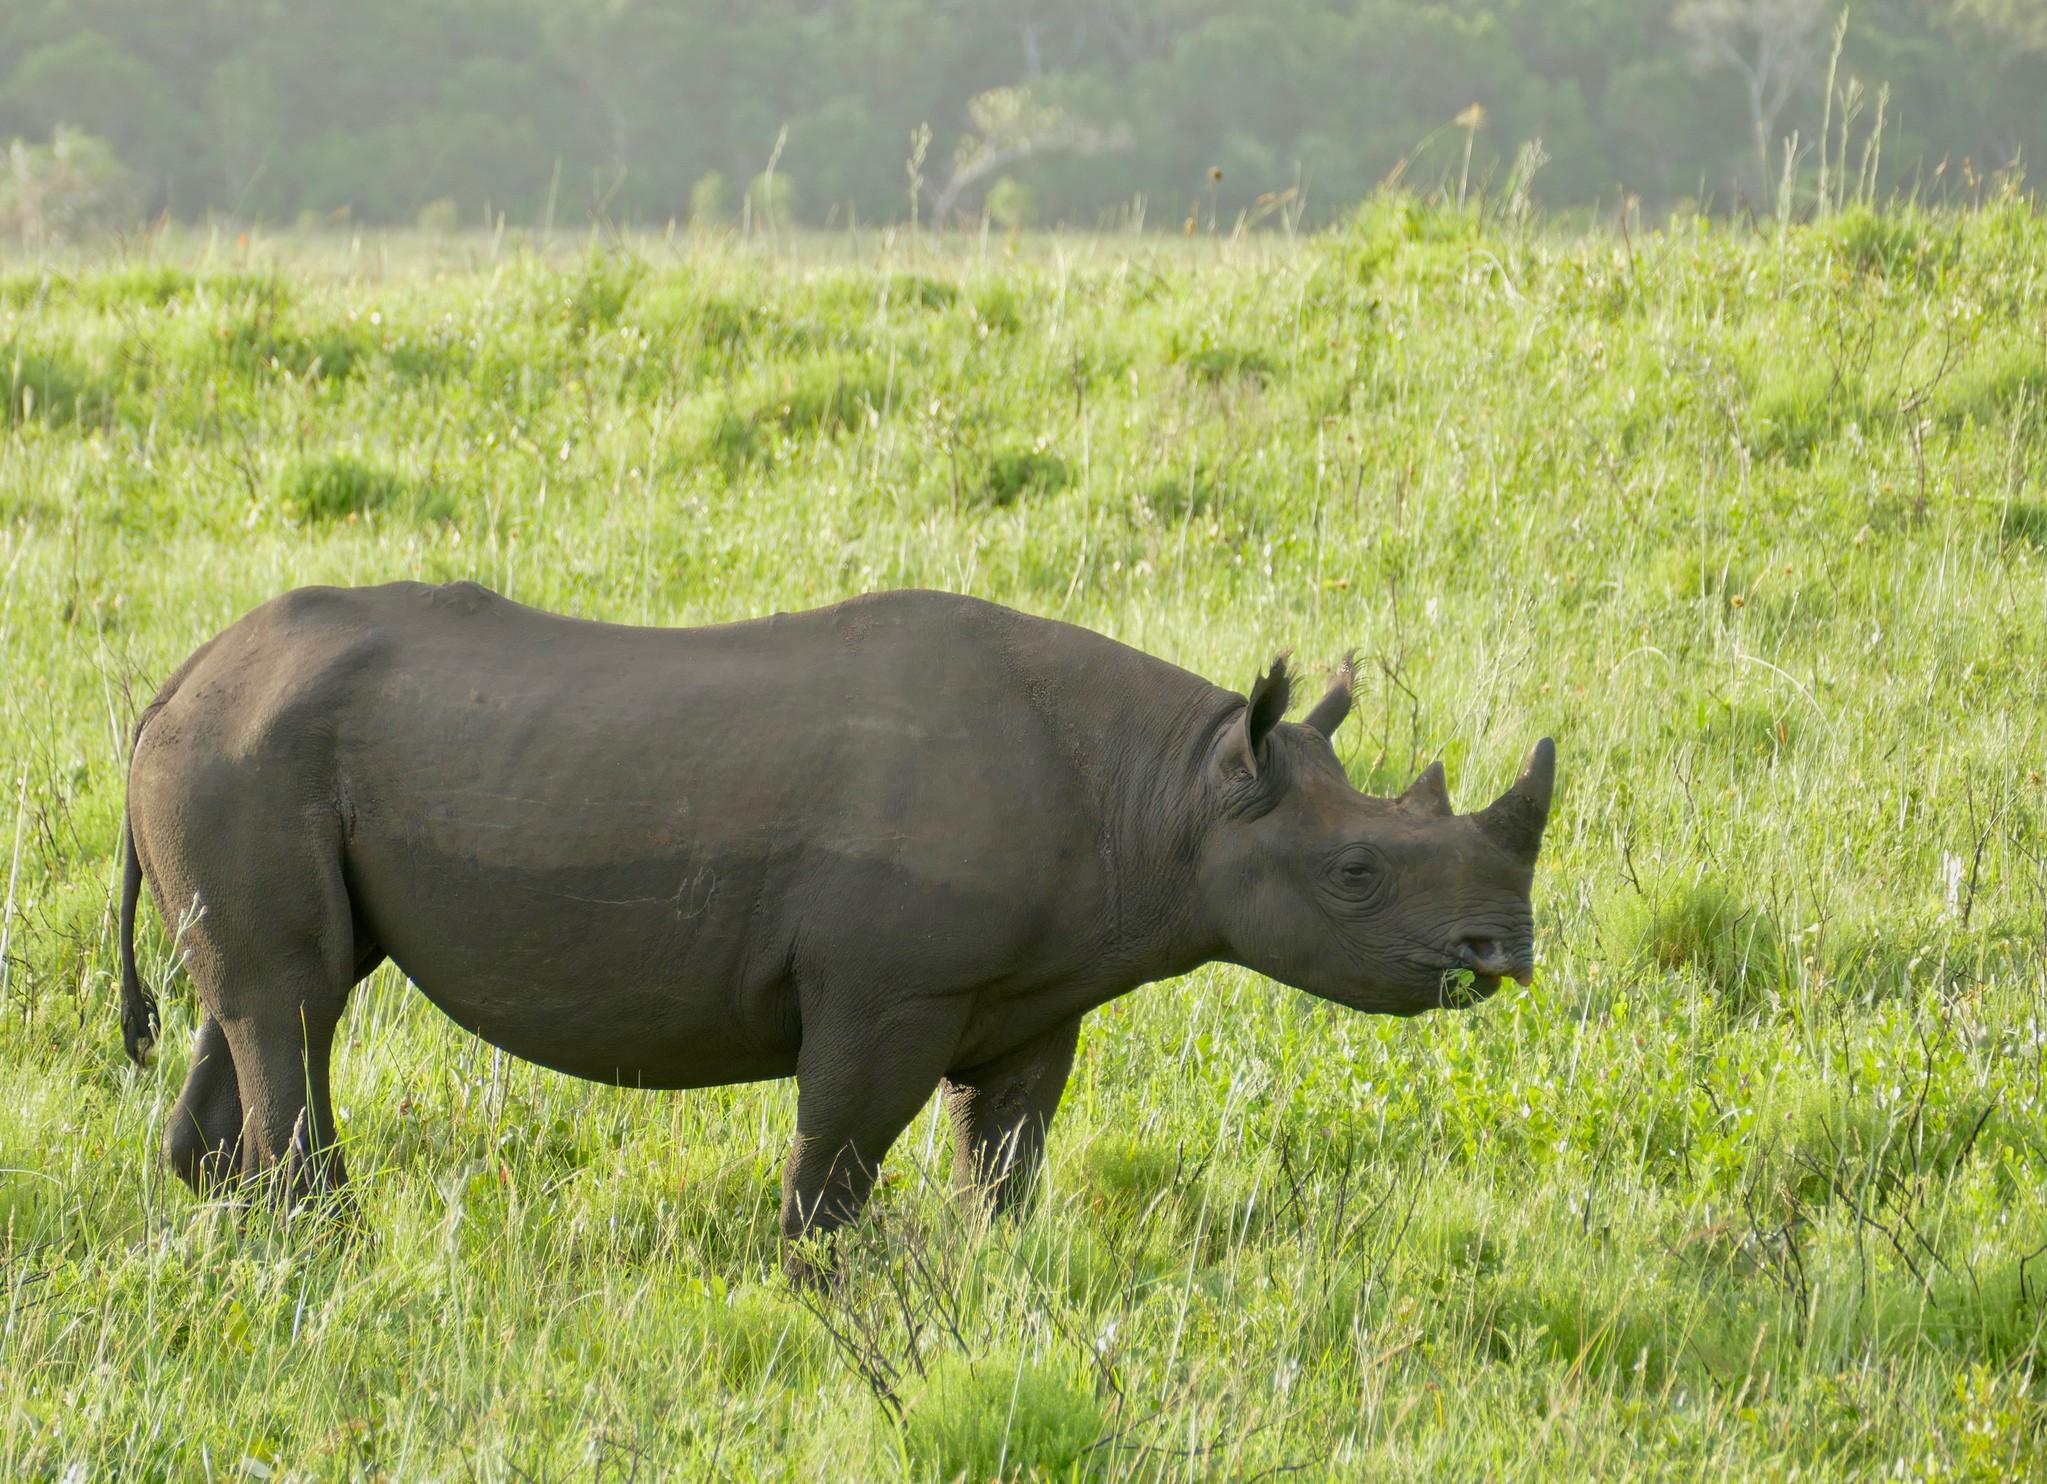 Un rinoceronte negro en Eastern Shores, iSimangaliso Wetland Park, St Lucia, KwaZulu-Natal, Sudáfrica. Foto: Flickr / Bernard Dupont